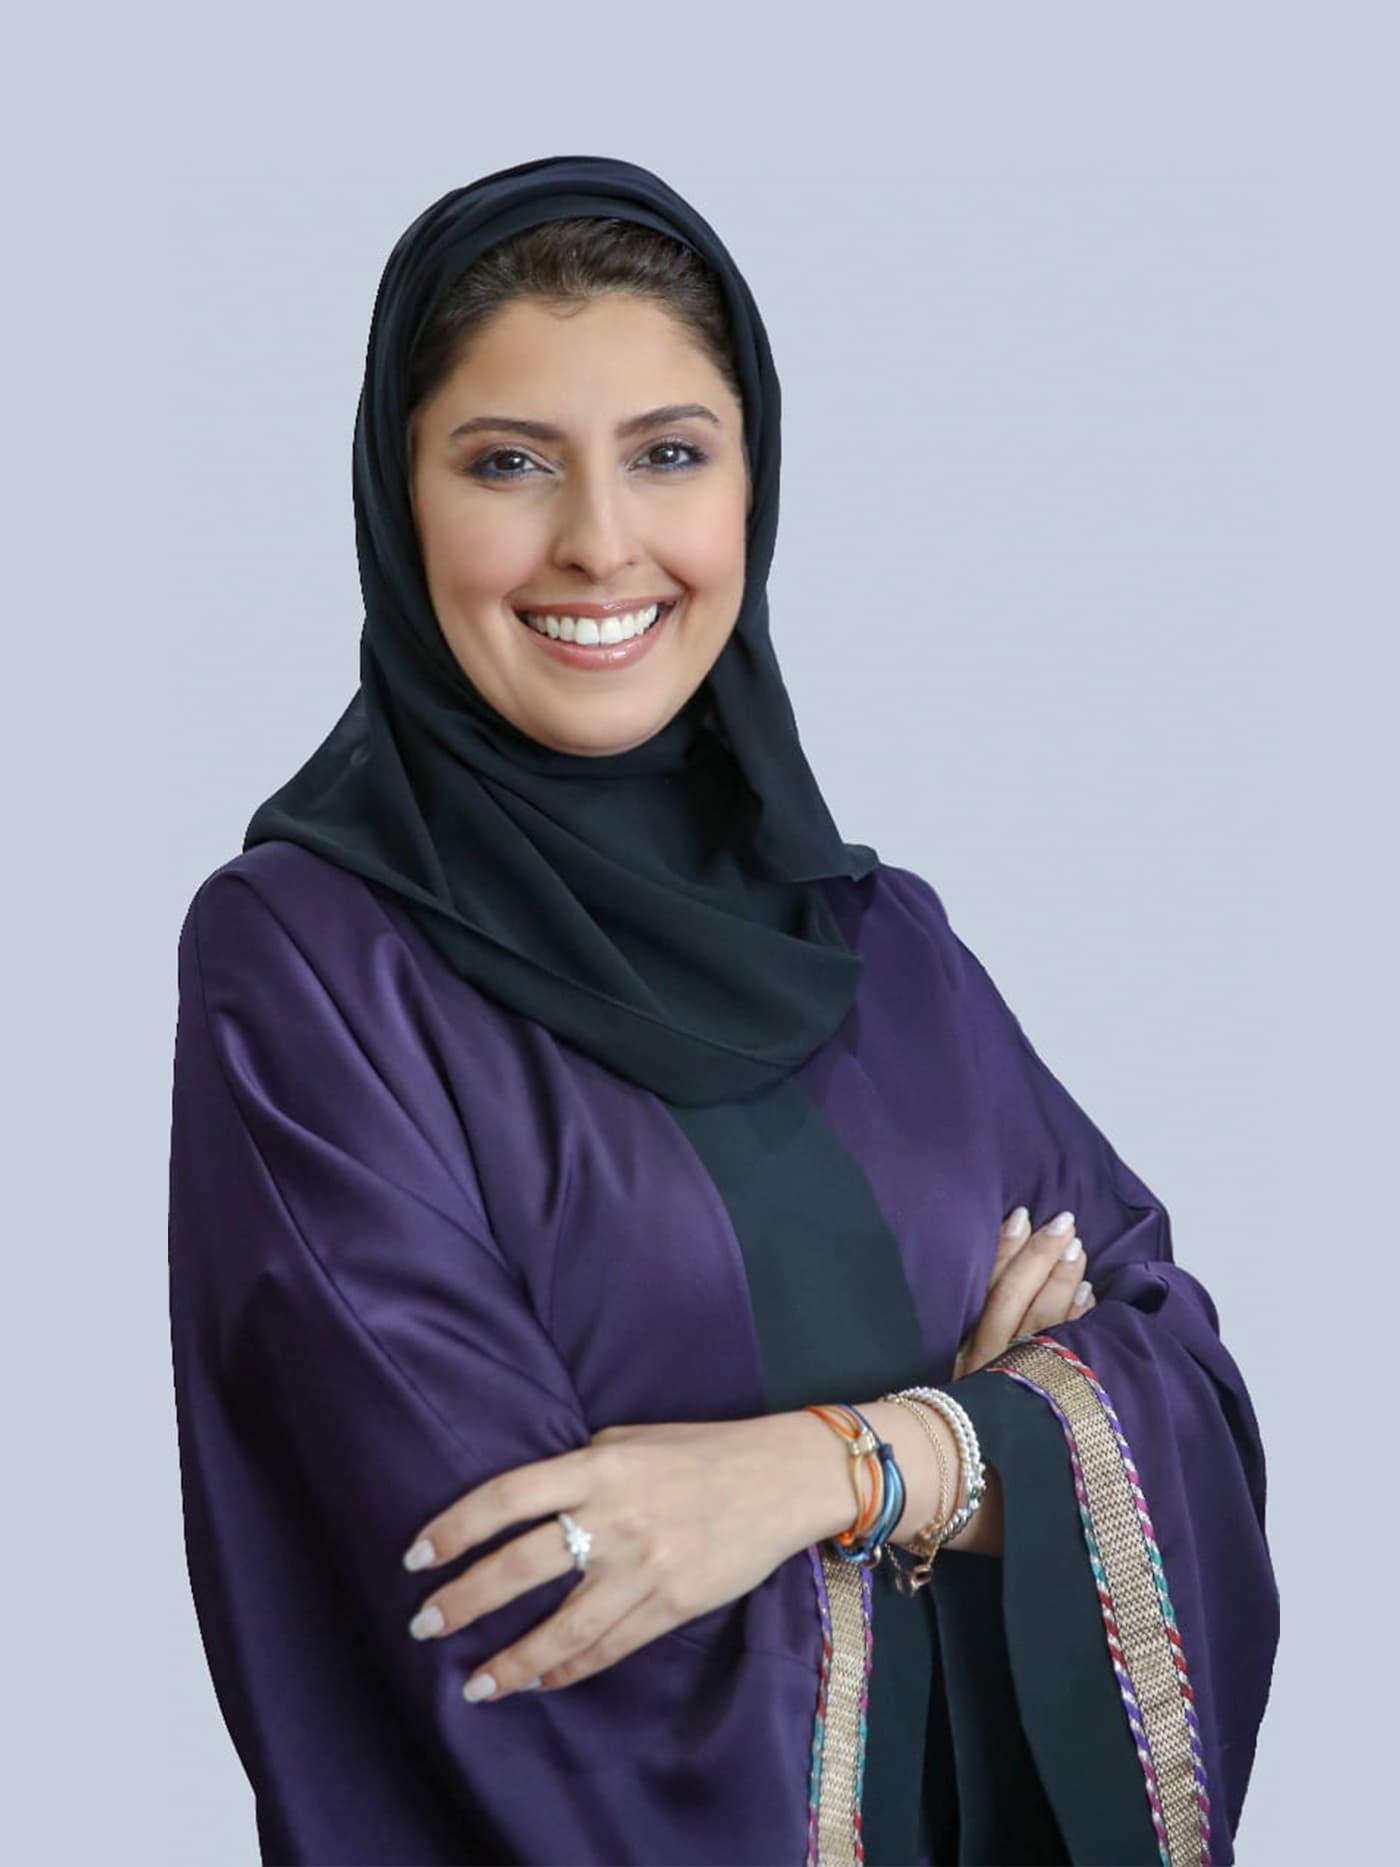 Lama Alshethri named editor-in-chief of Sayidaty magazine.